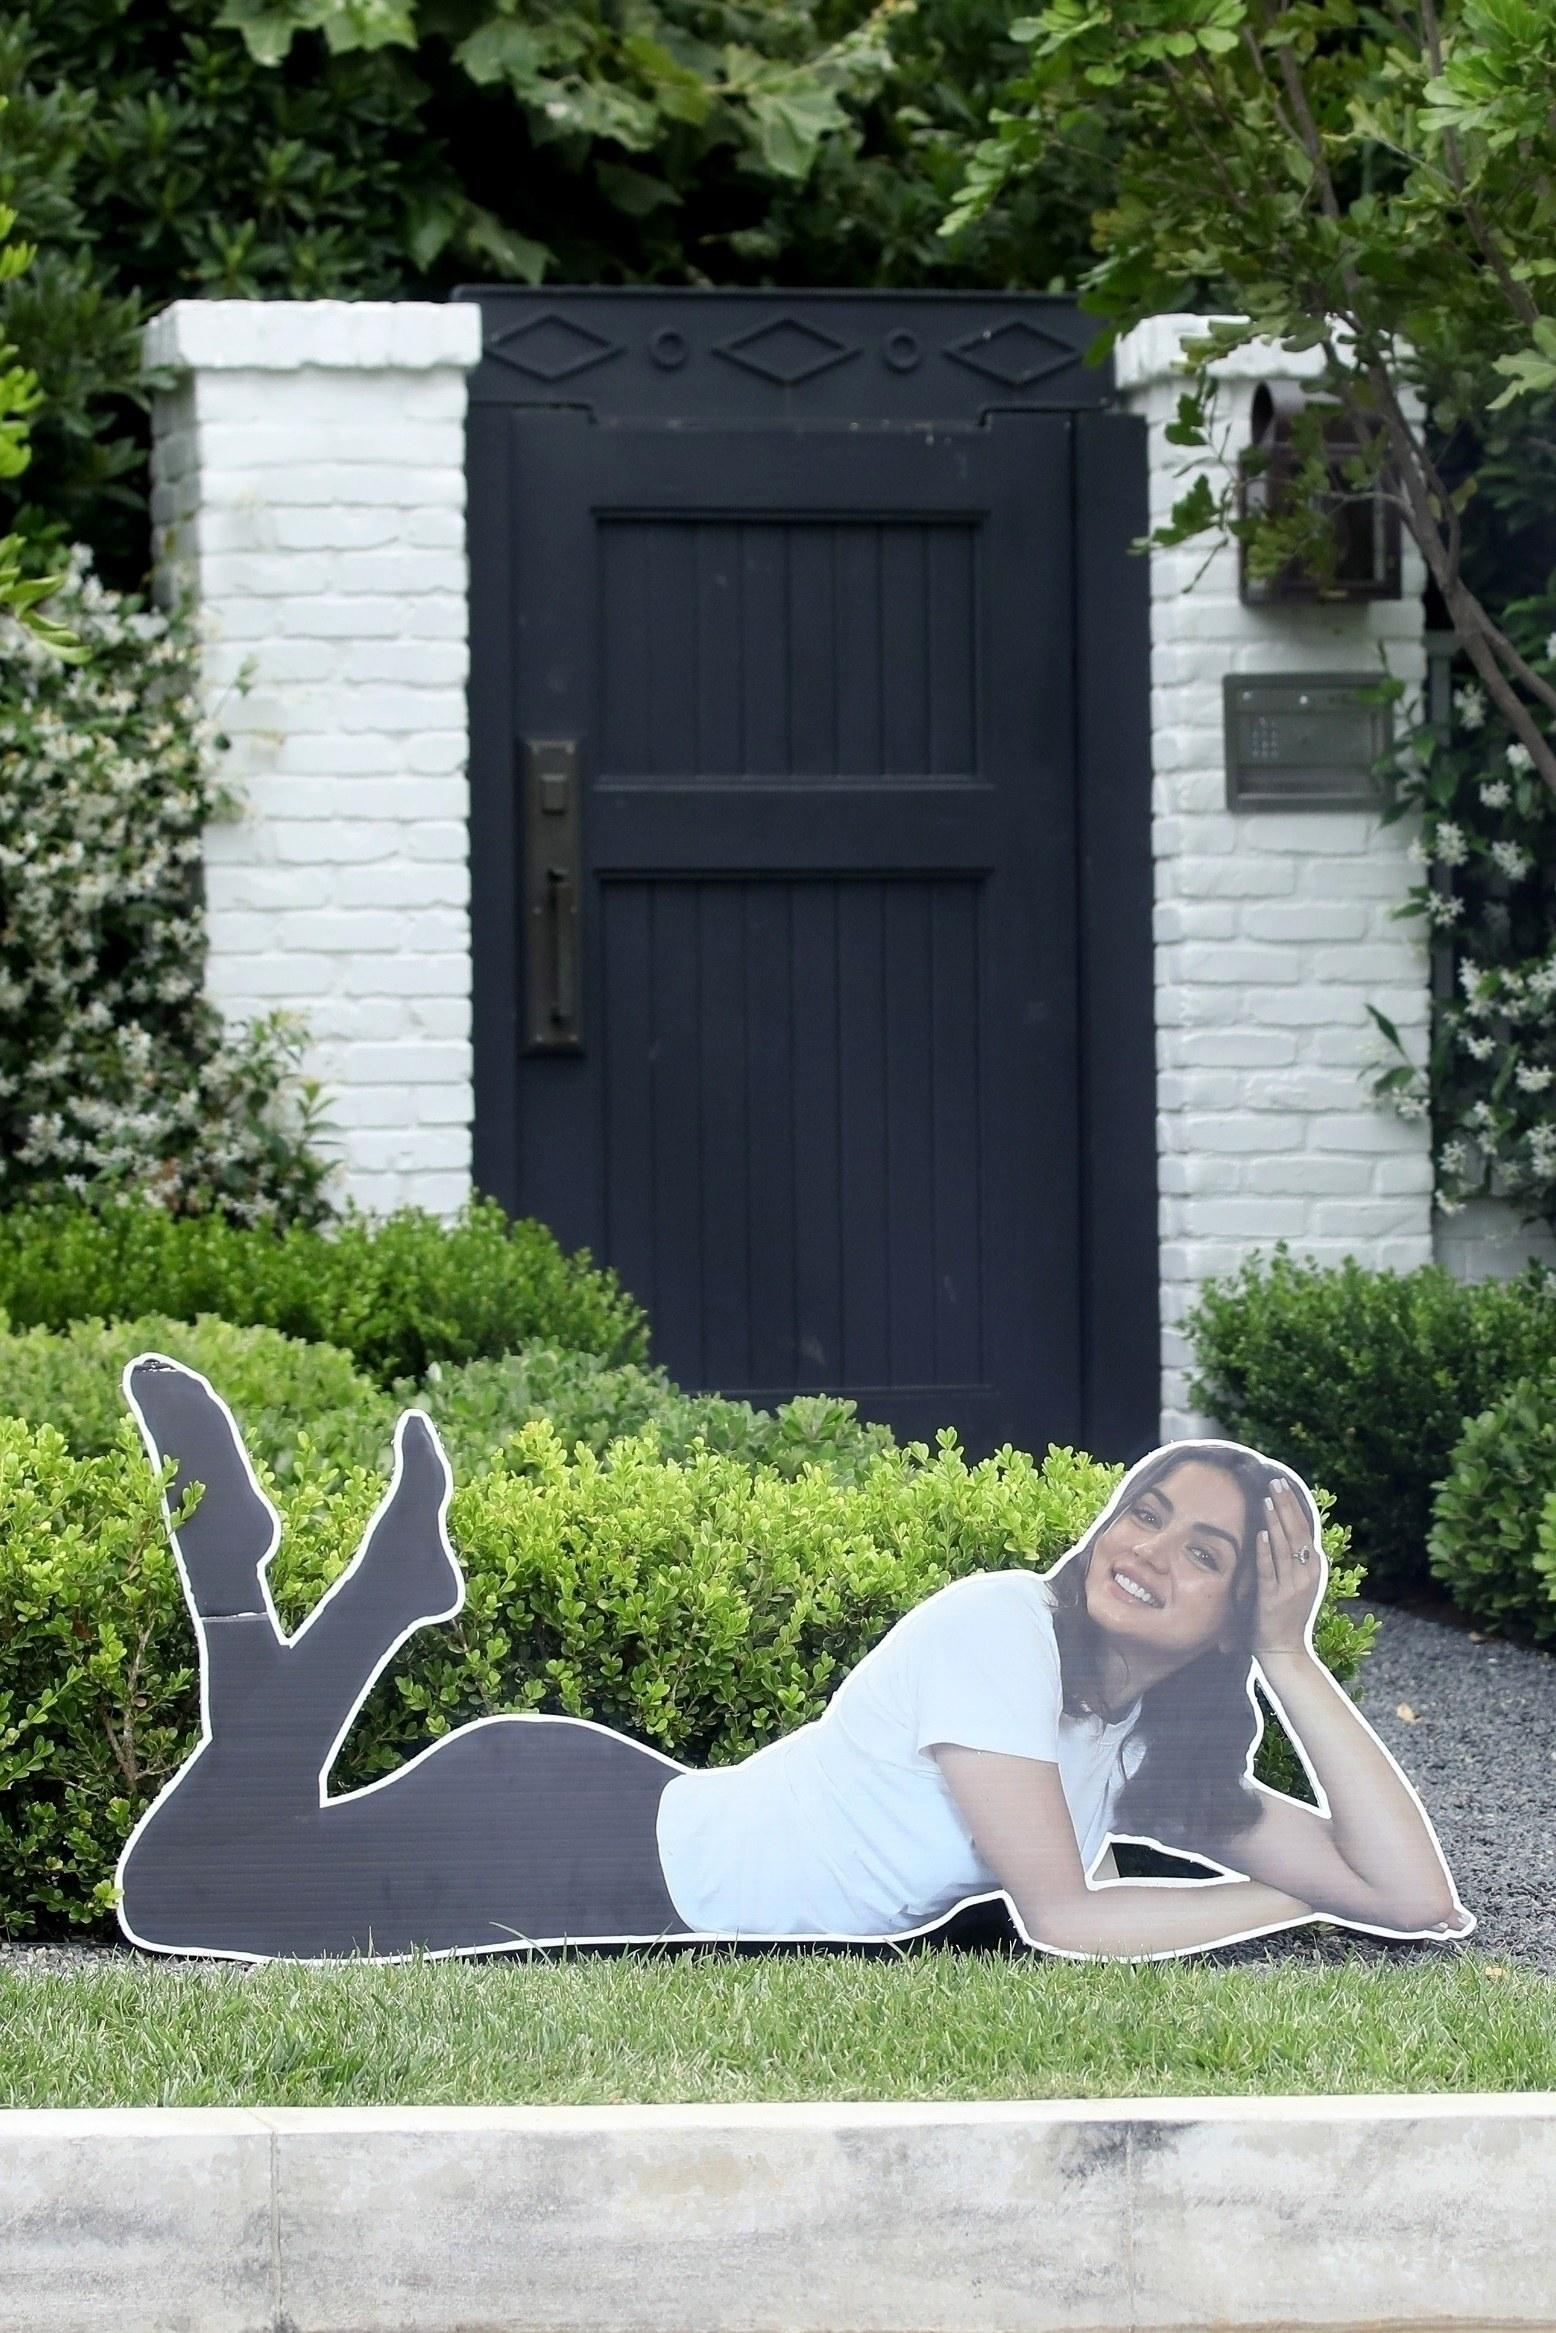 ana posing in cardboard form